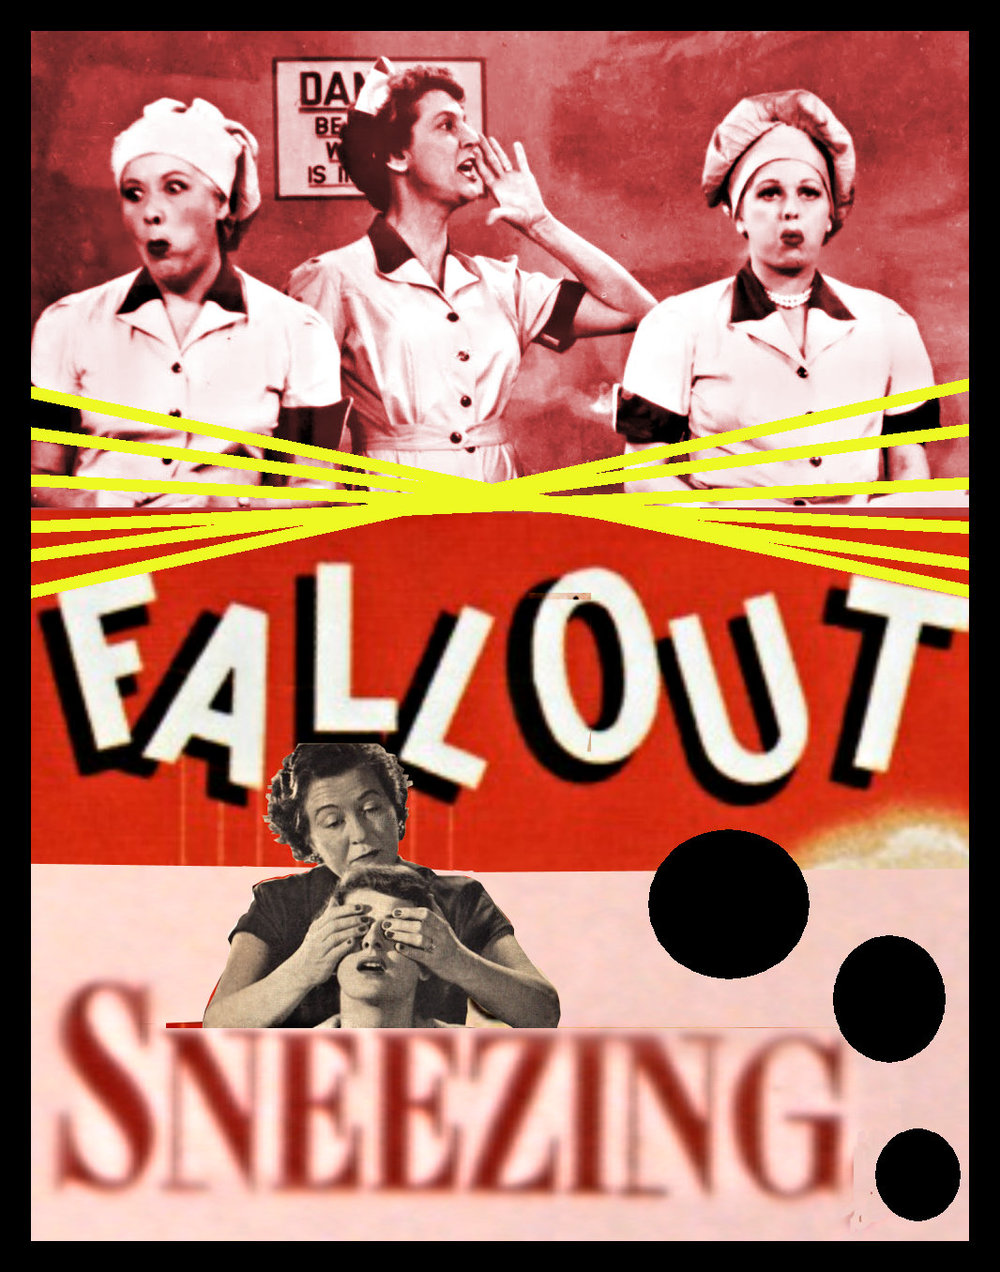 fallout sneezing 12bg.jpg